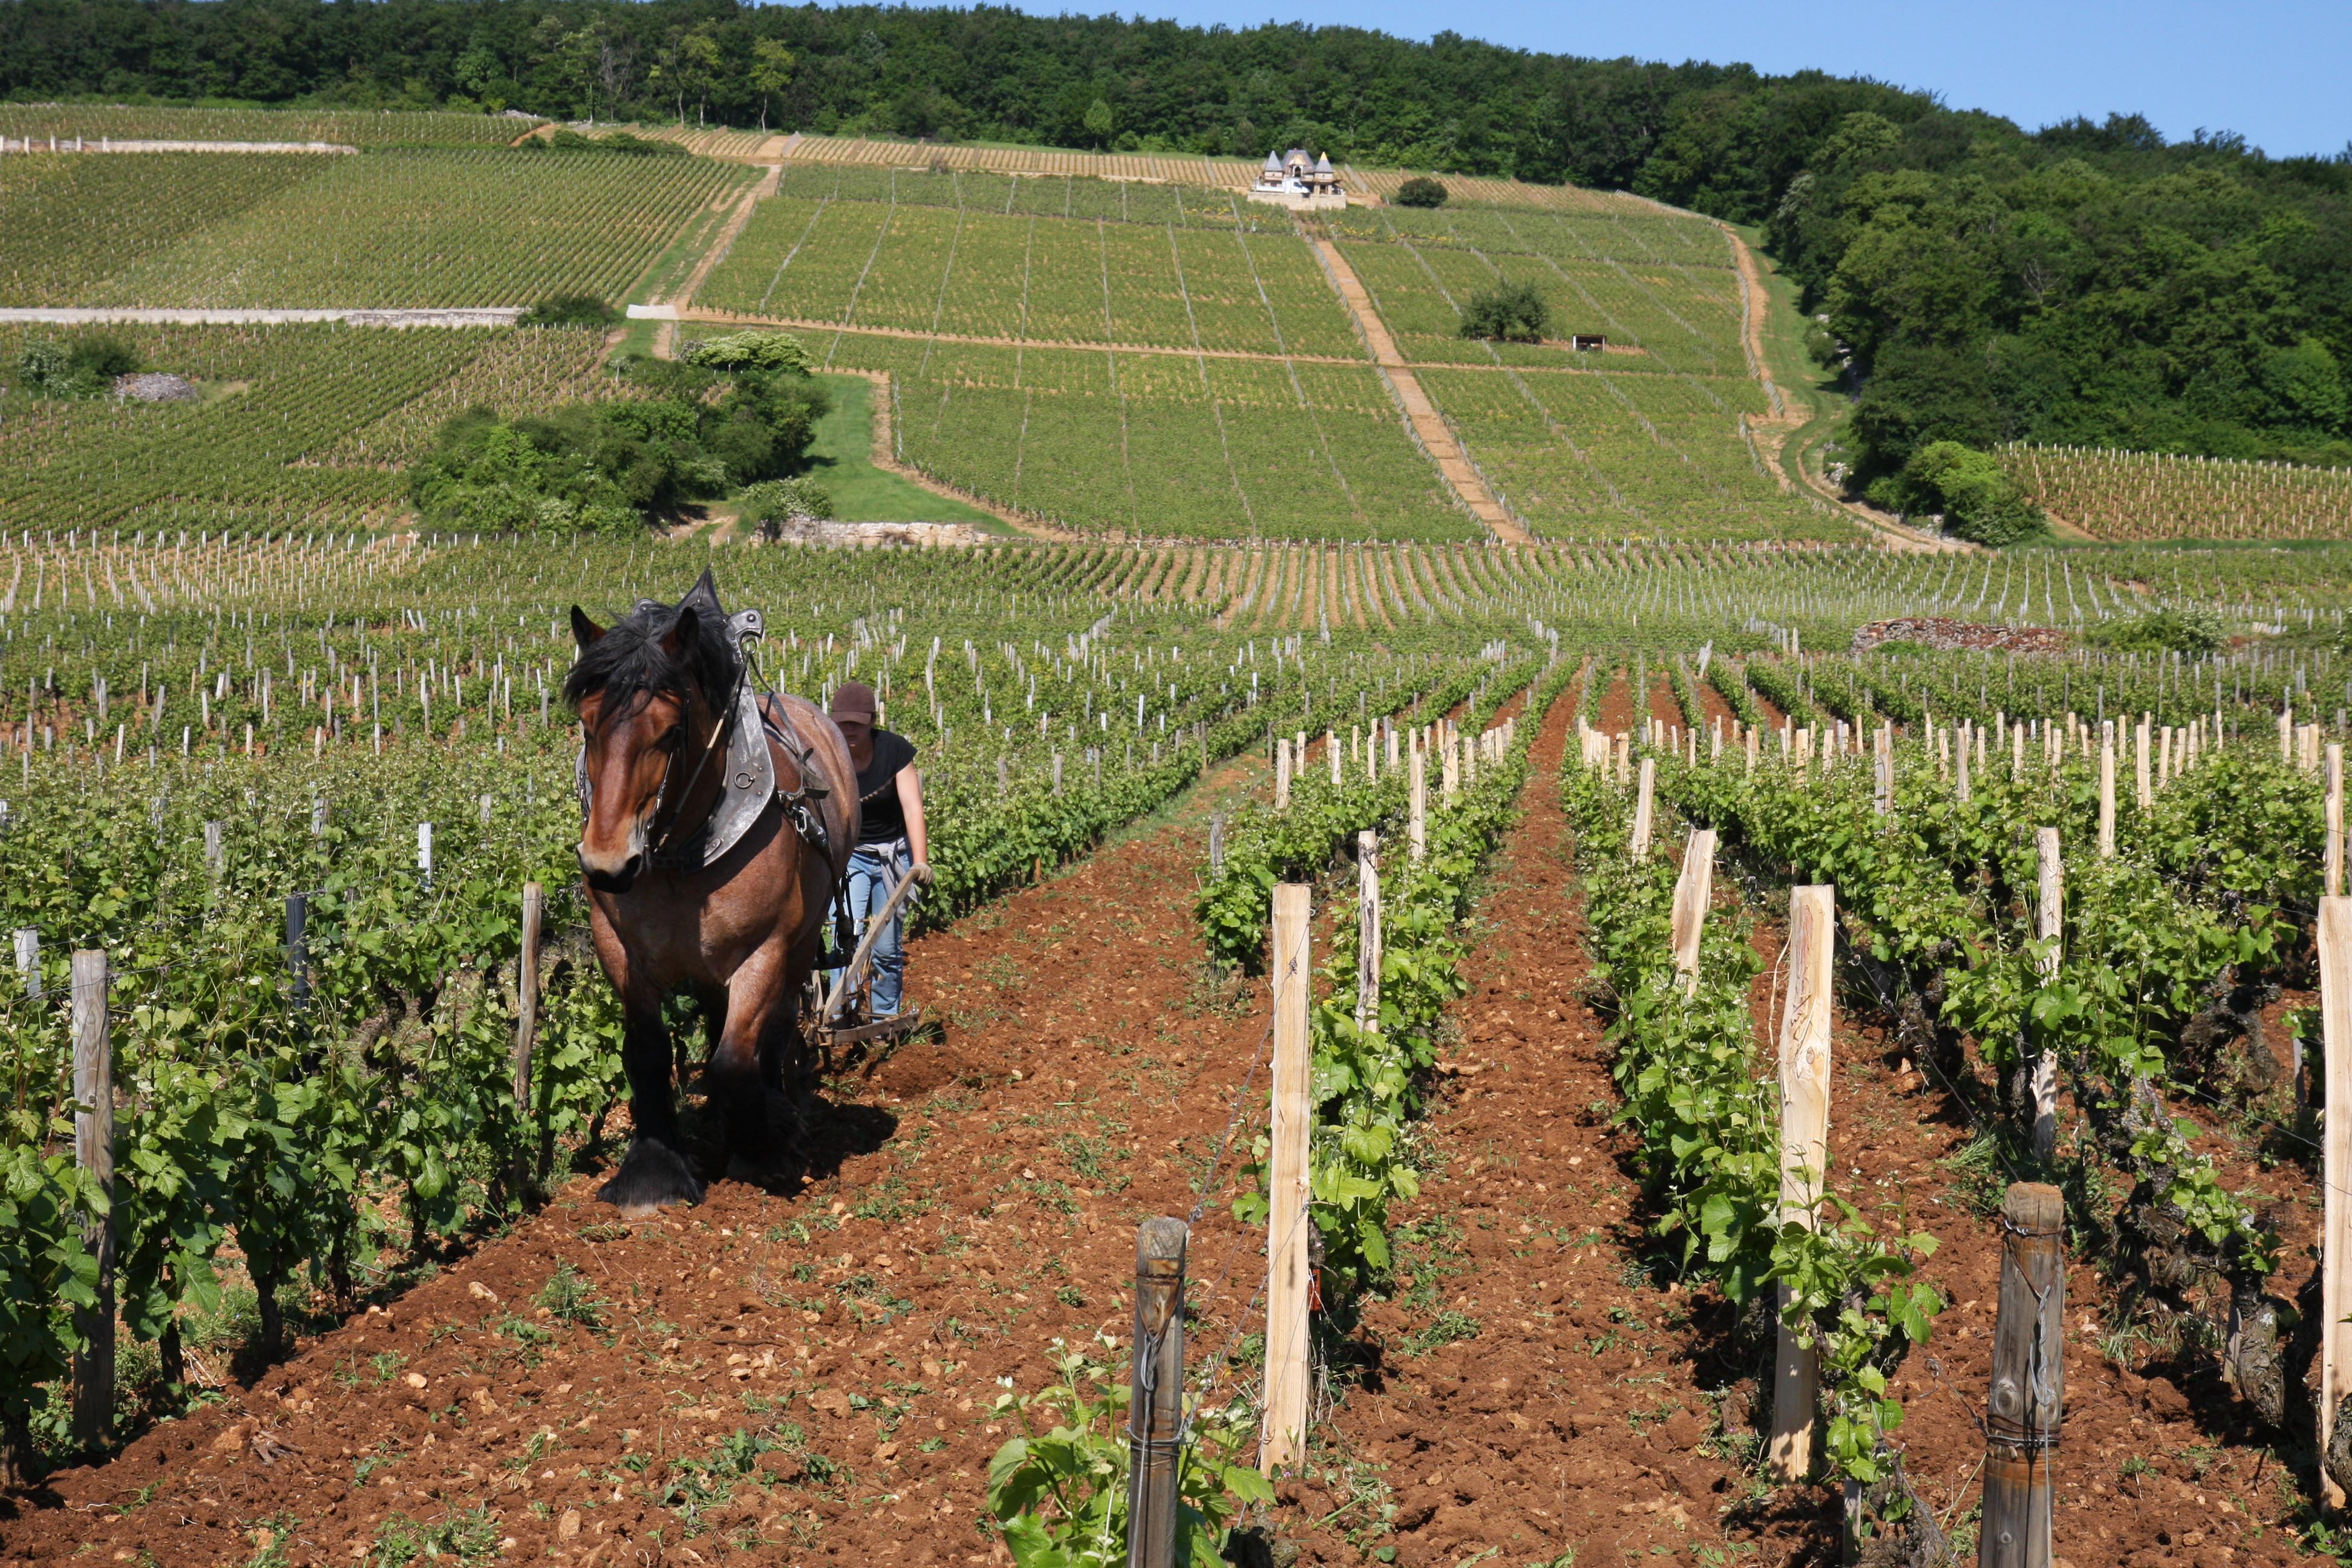 Horse plowing the vineyards in Gevrey-Chambertin